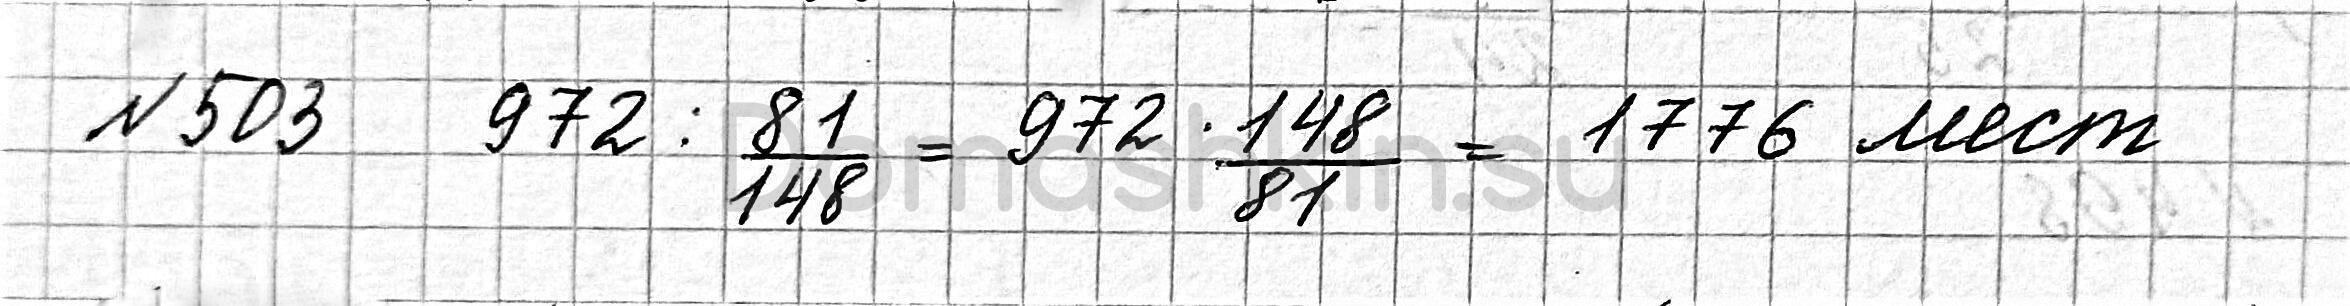 Математика 6 класс учебник Мерзляк номер 503 решение